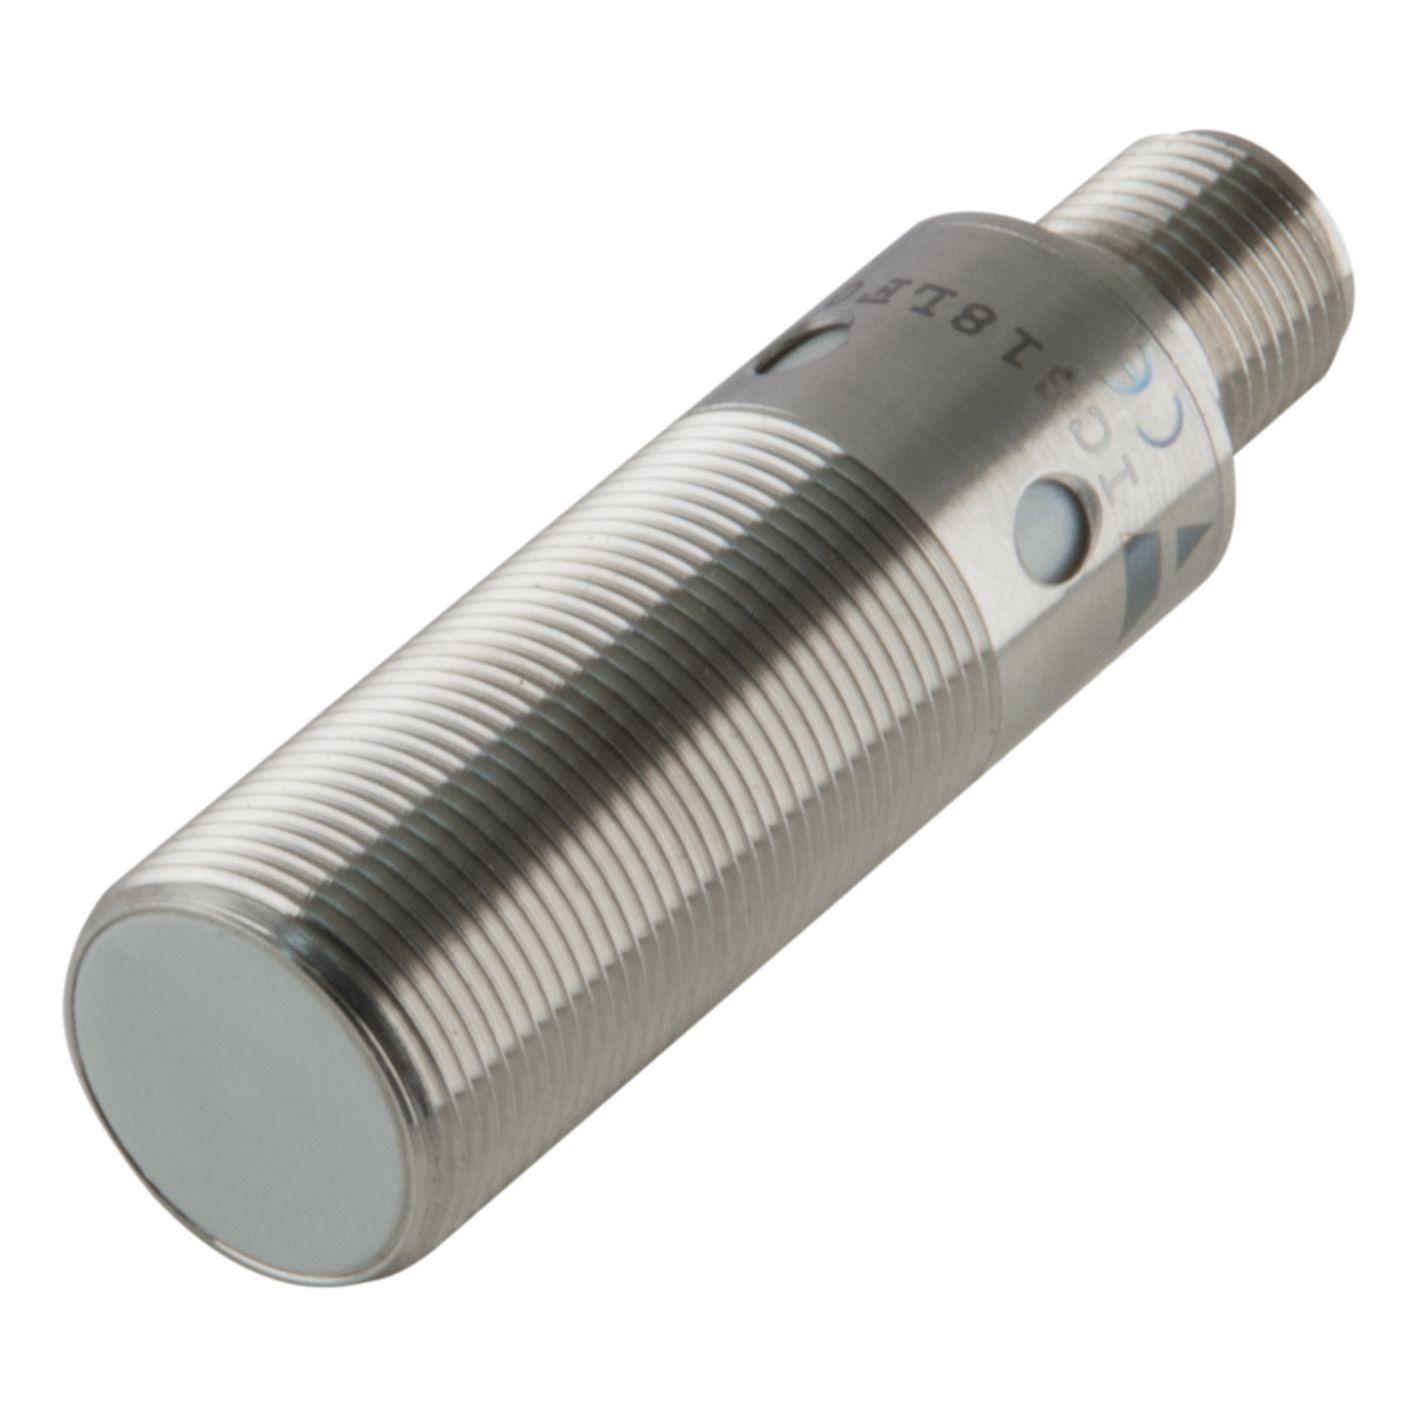 Induktiv Sensor ICS18LF08